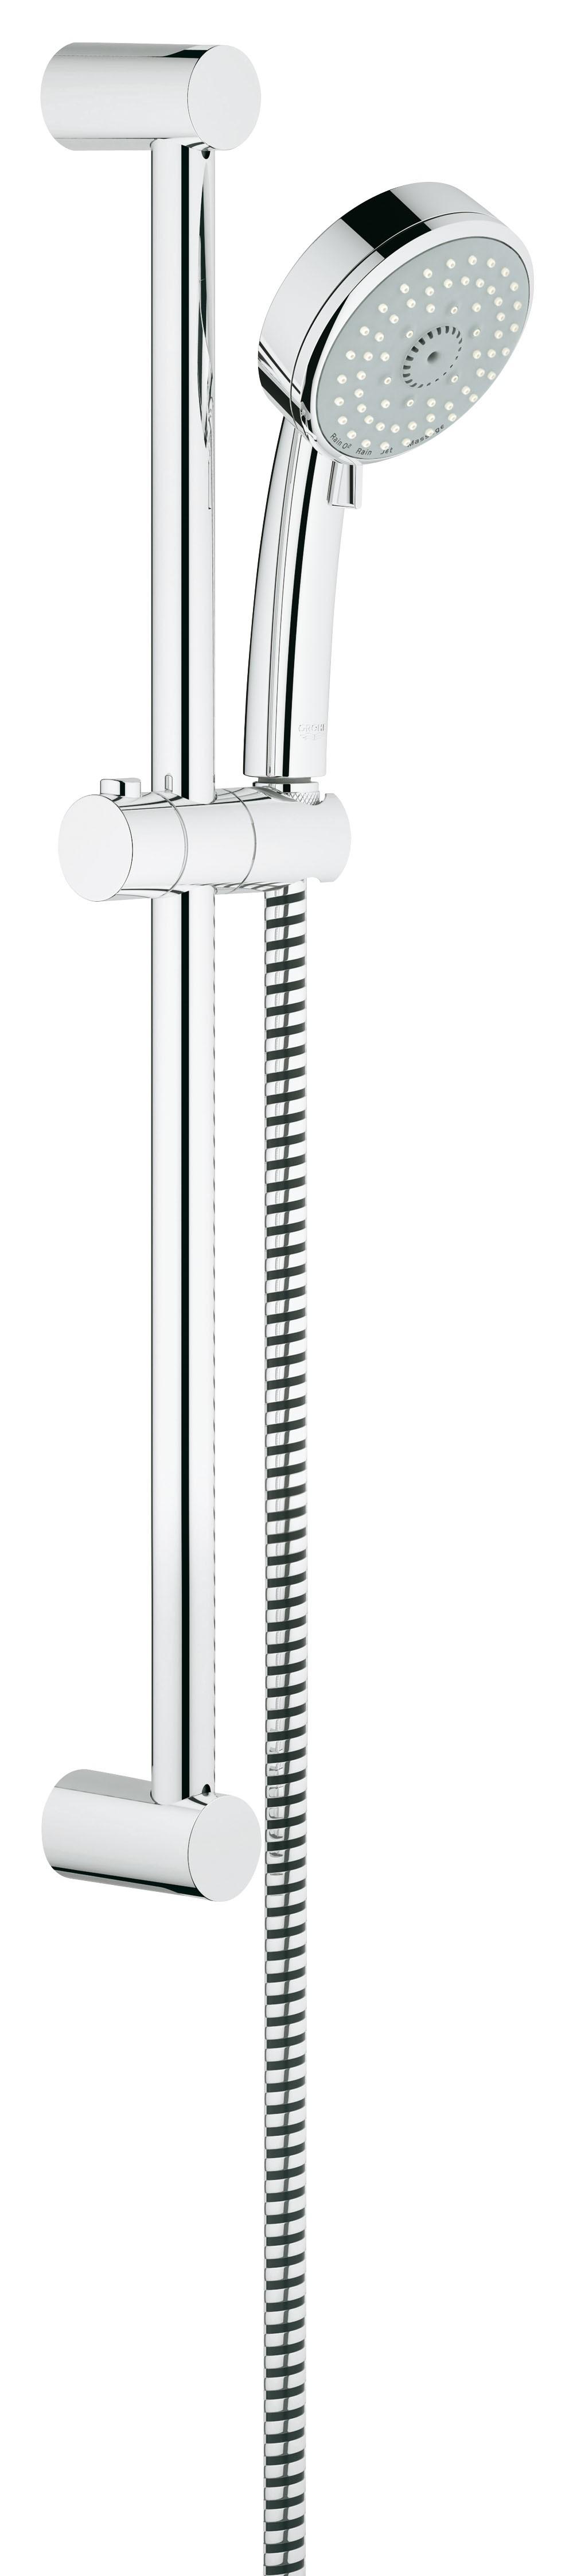 Душевой гарнитур Grohe 27580001 Tempesta Cosmopolitan (ручной душ, штанга 600 мм, шланг 1750 мм), хром